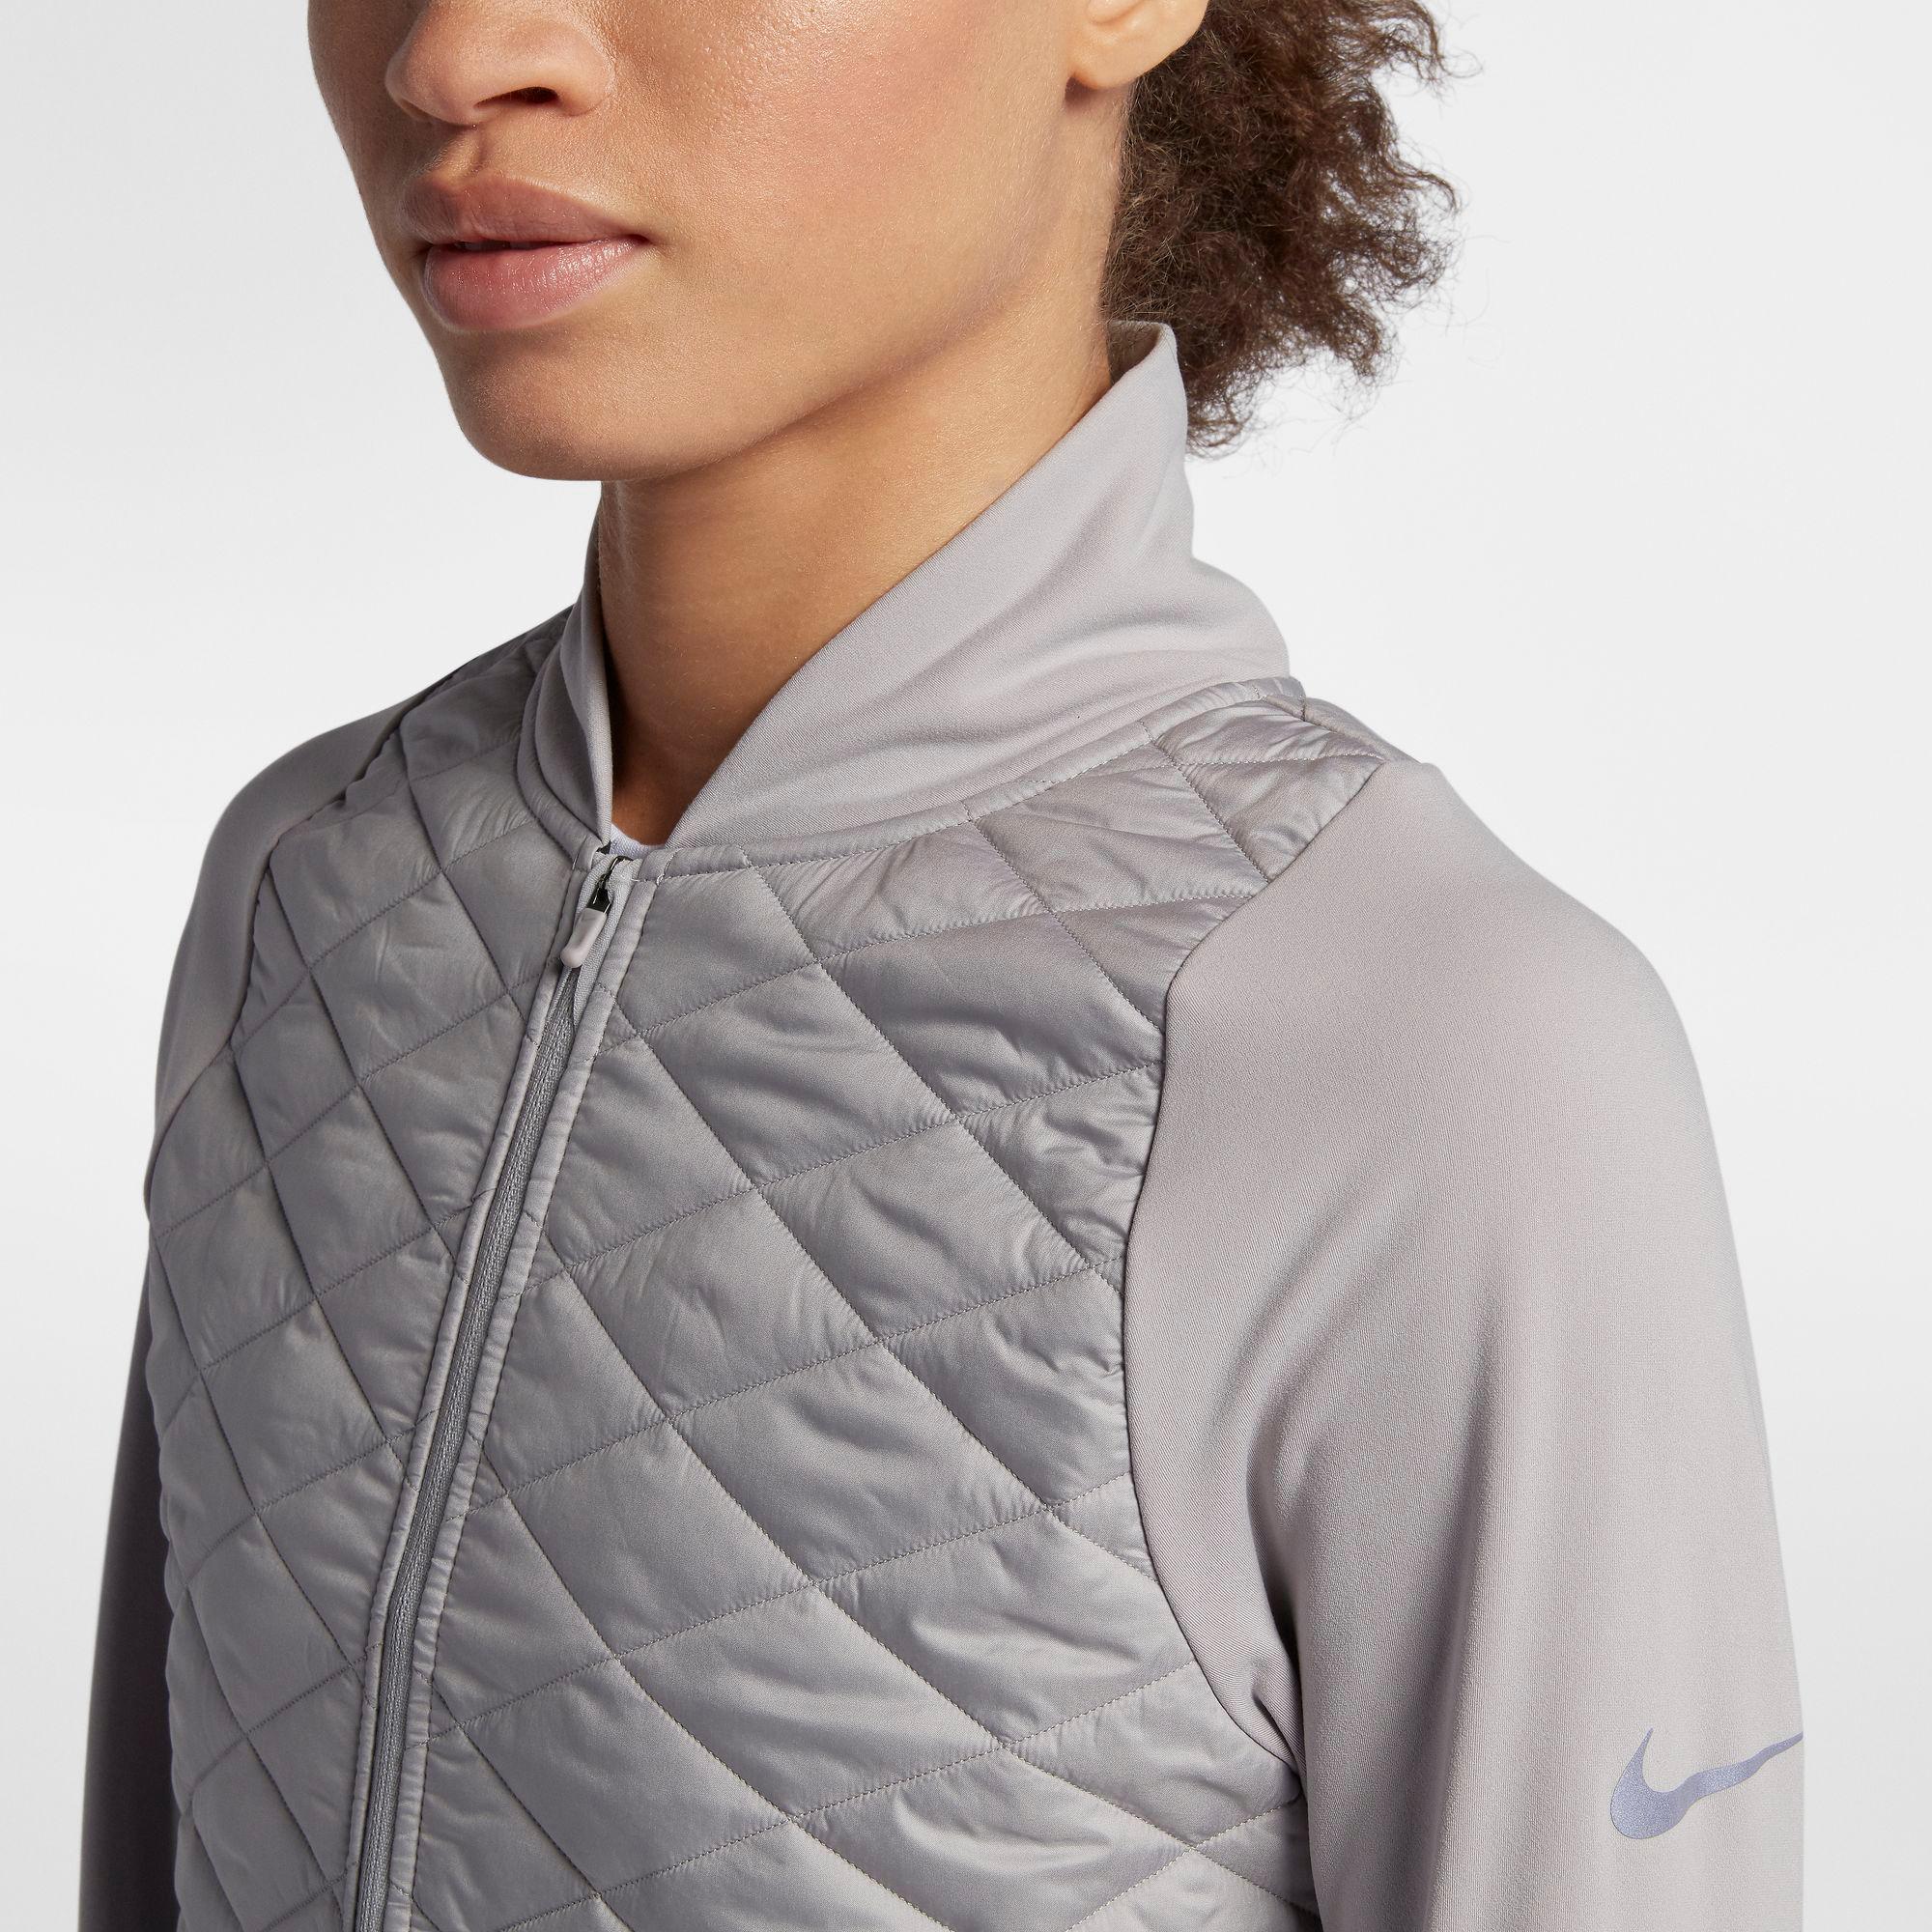 Nike Aeroloft Laufjacke Damen atmosphere greyvast grey